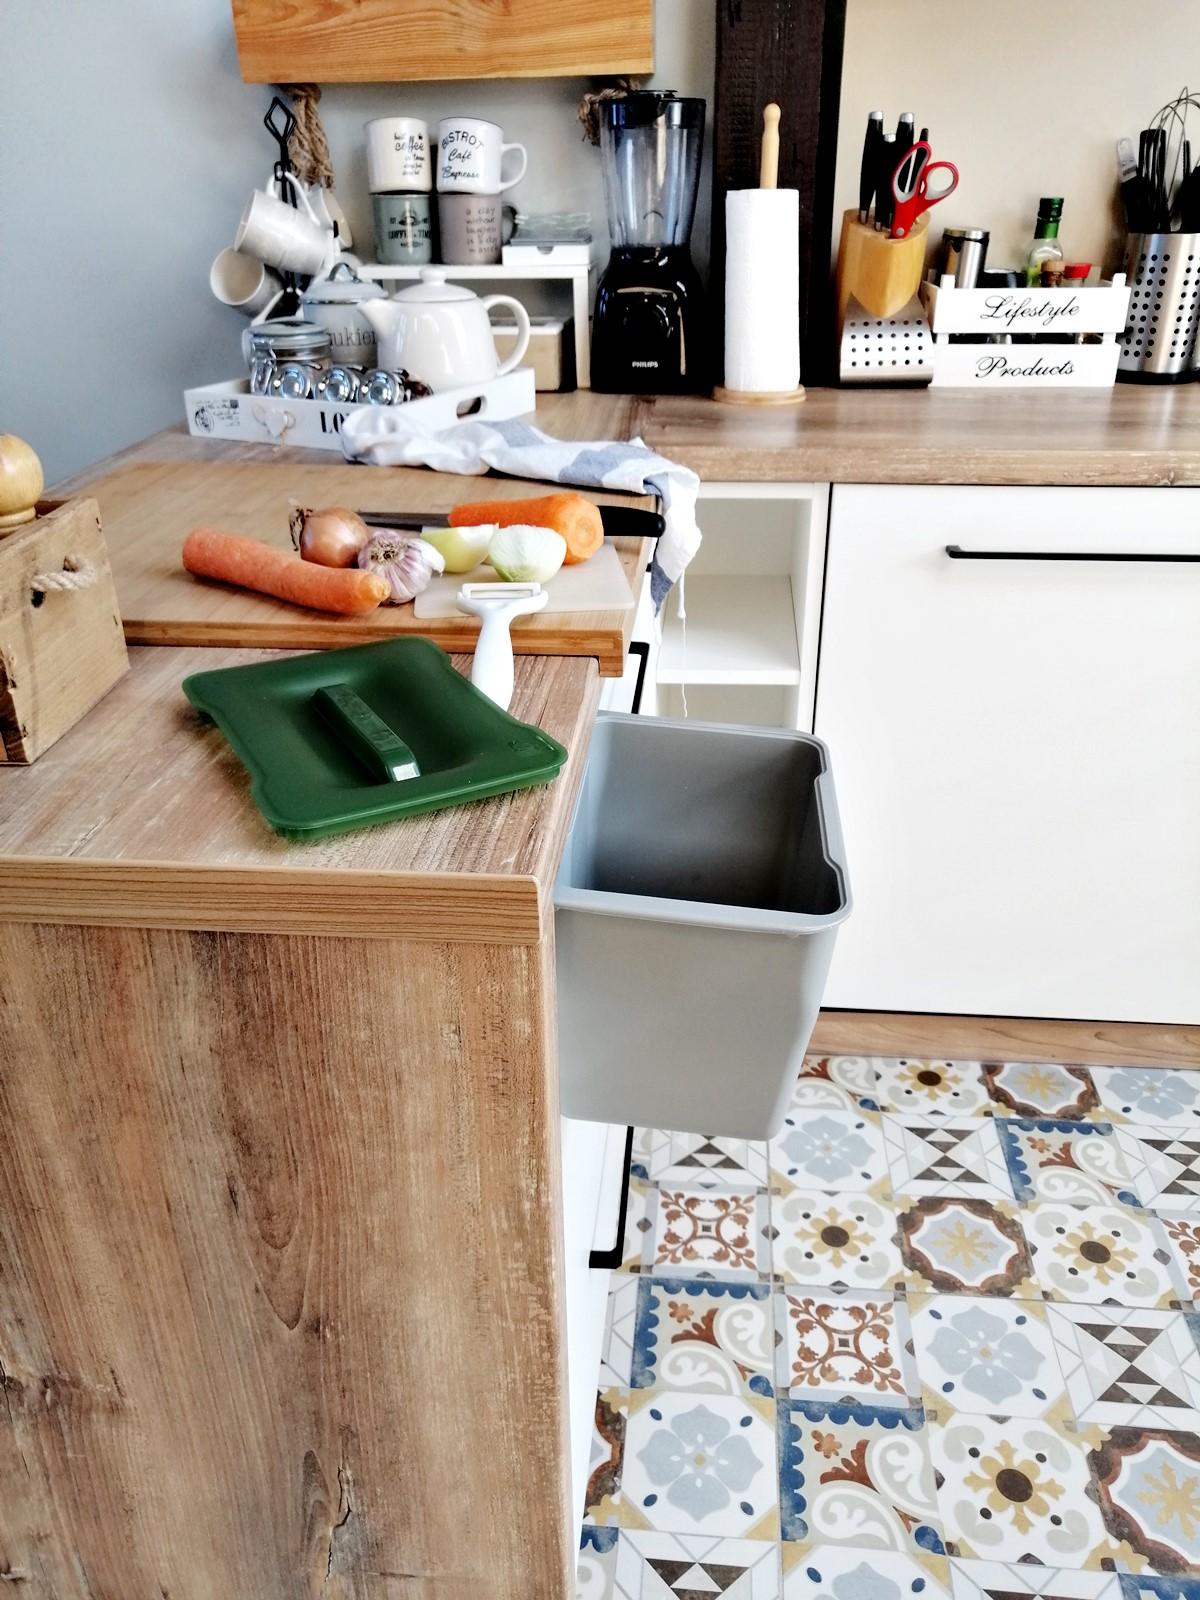 kosz na odpadki do kuchni